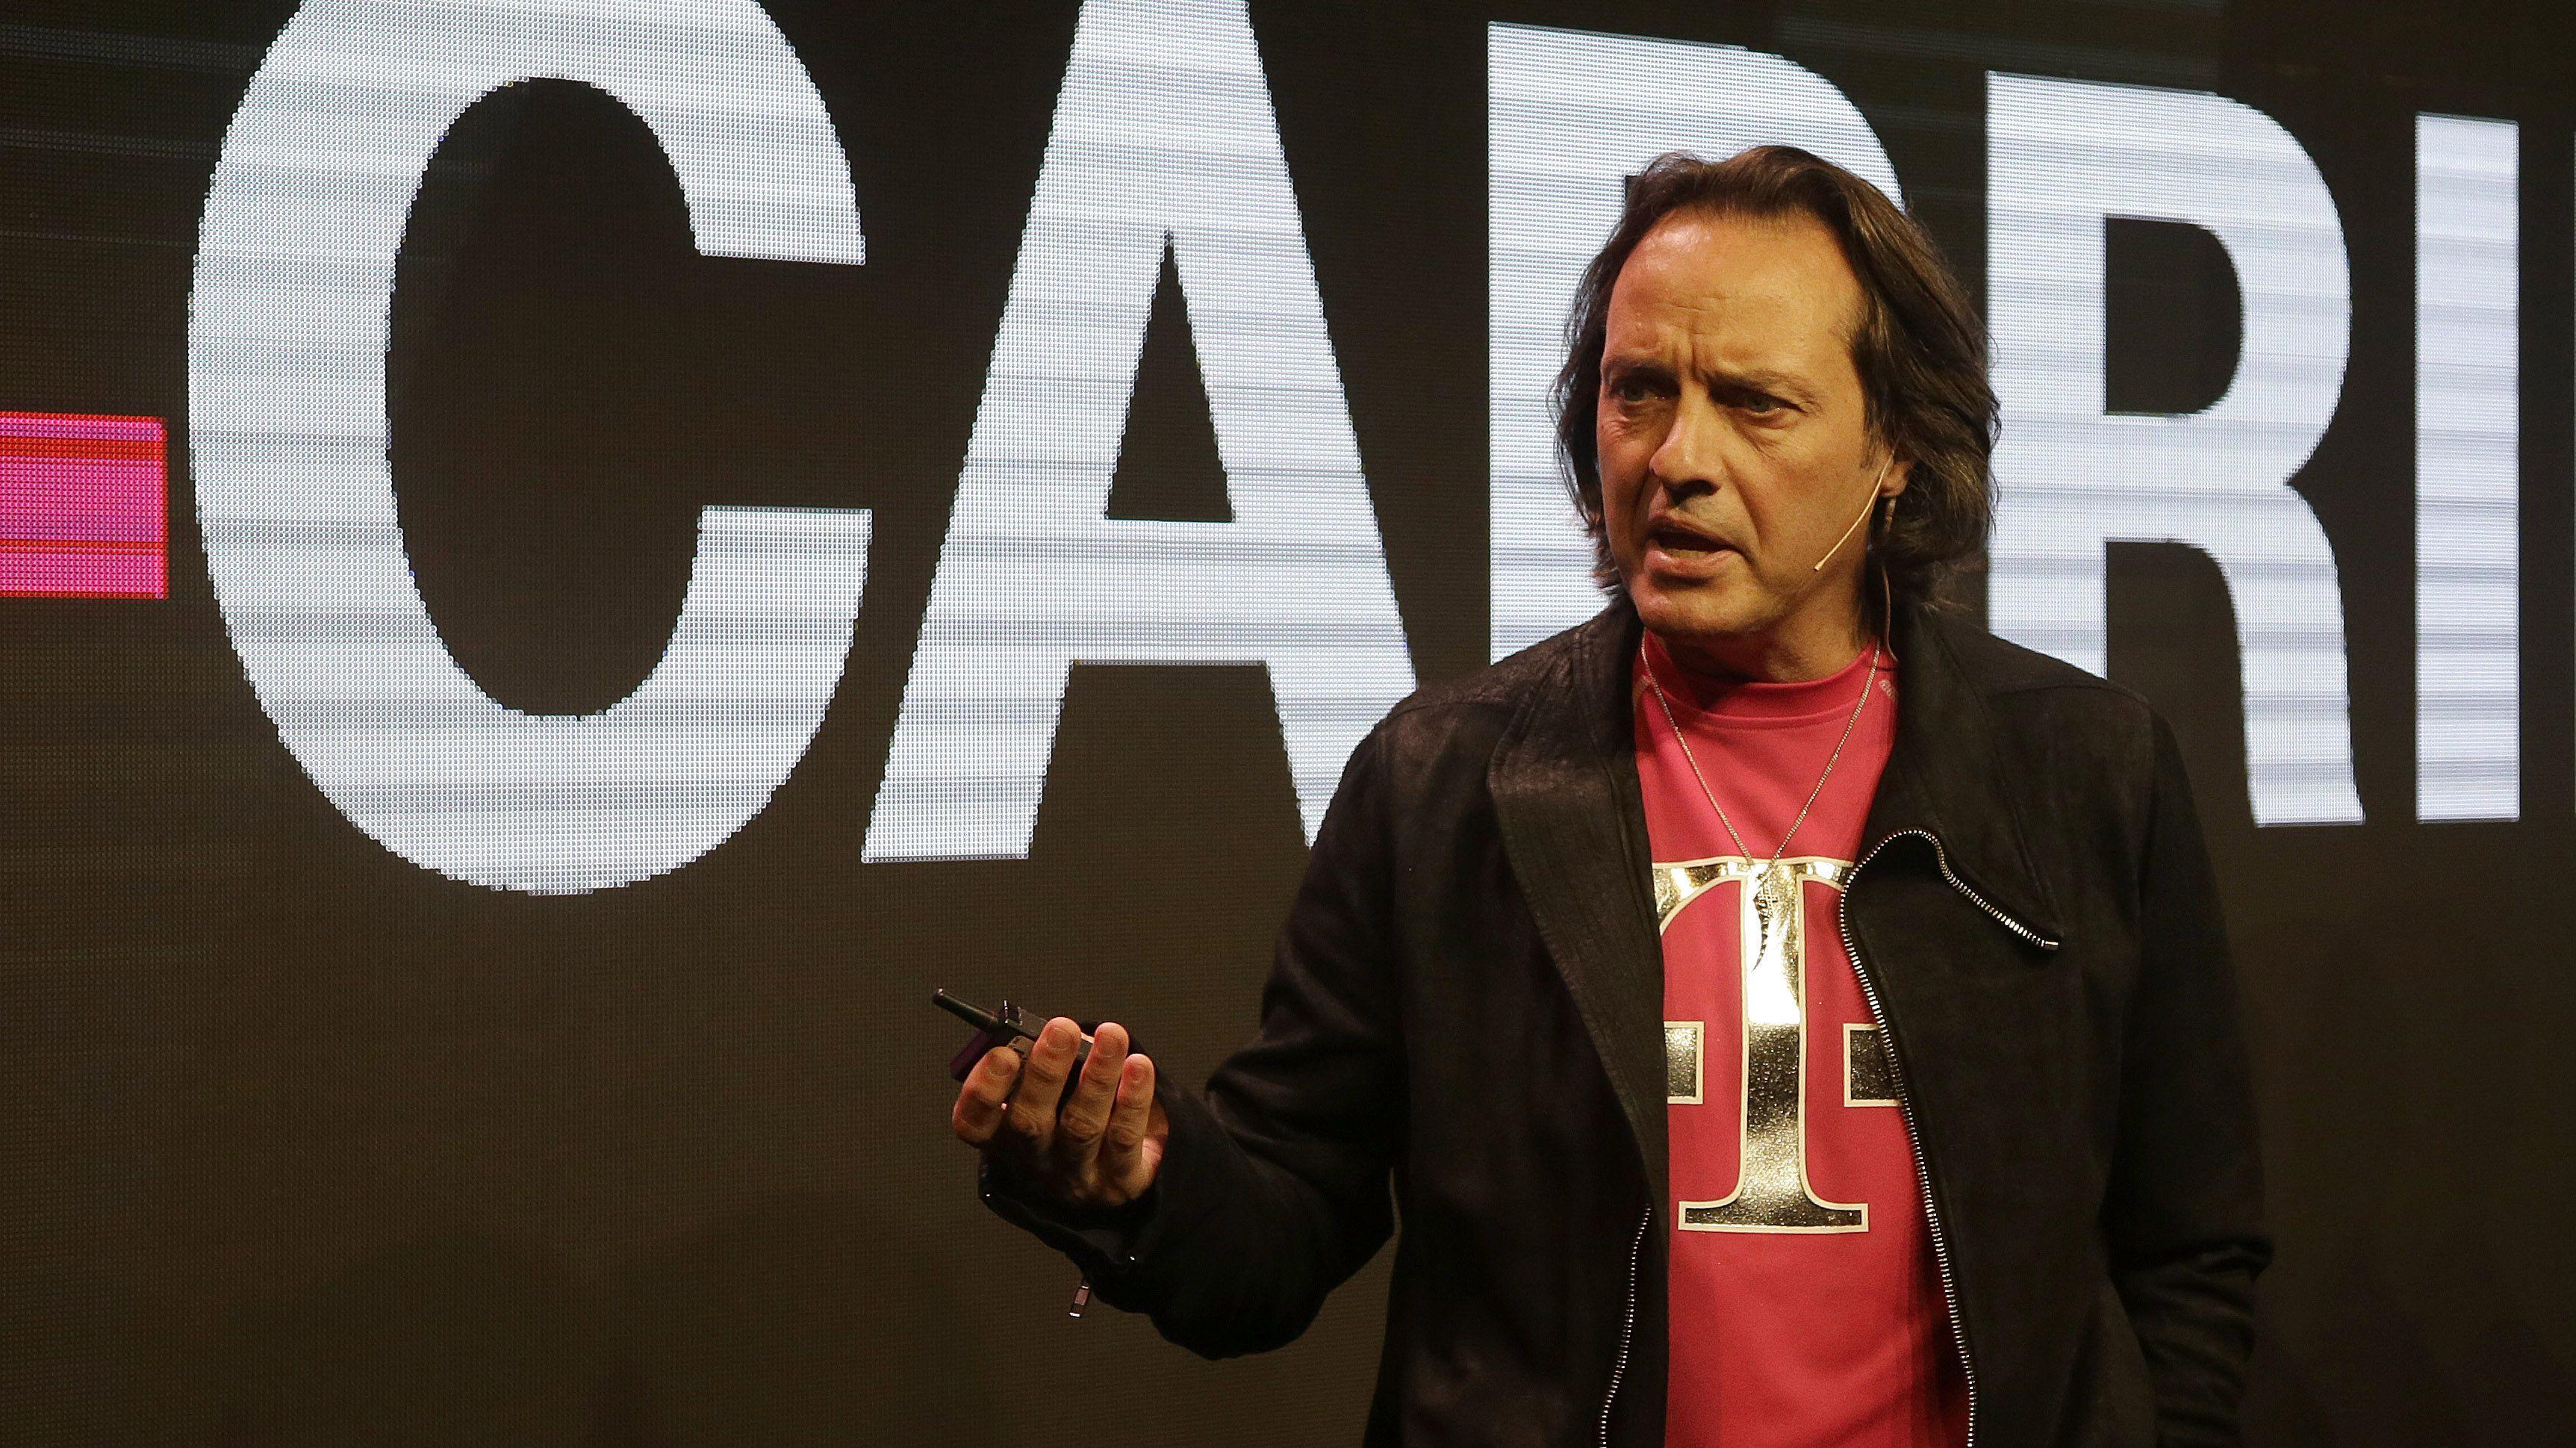 John Legere T-Mobile Net Neutrality